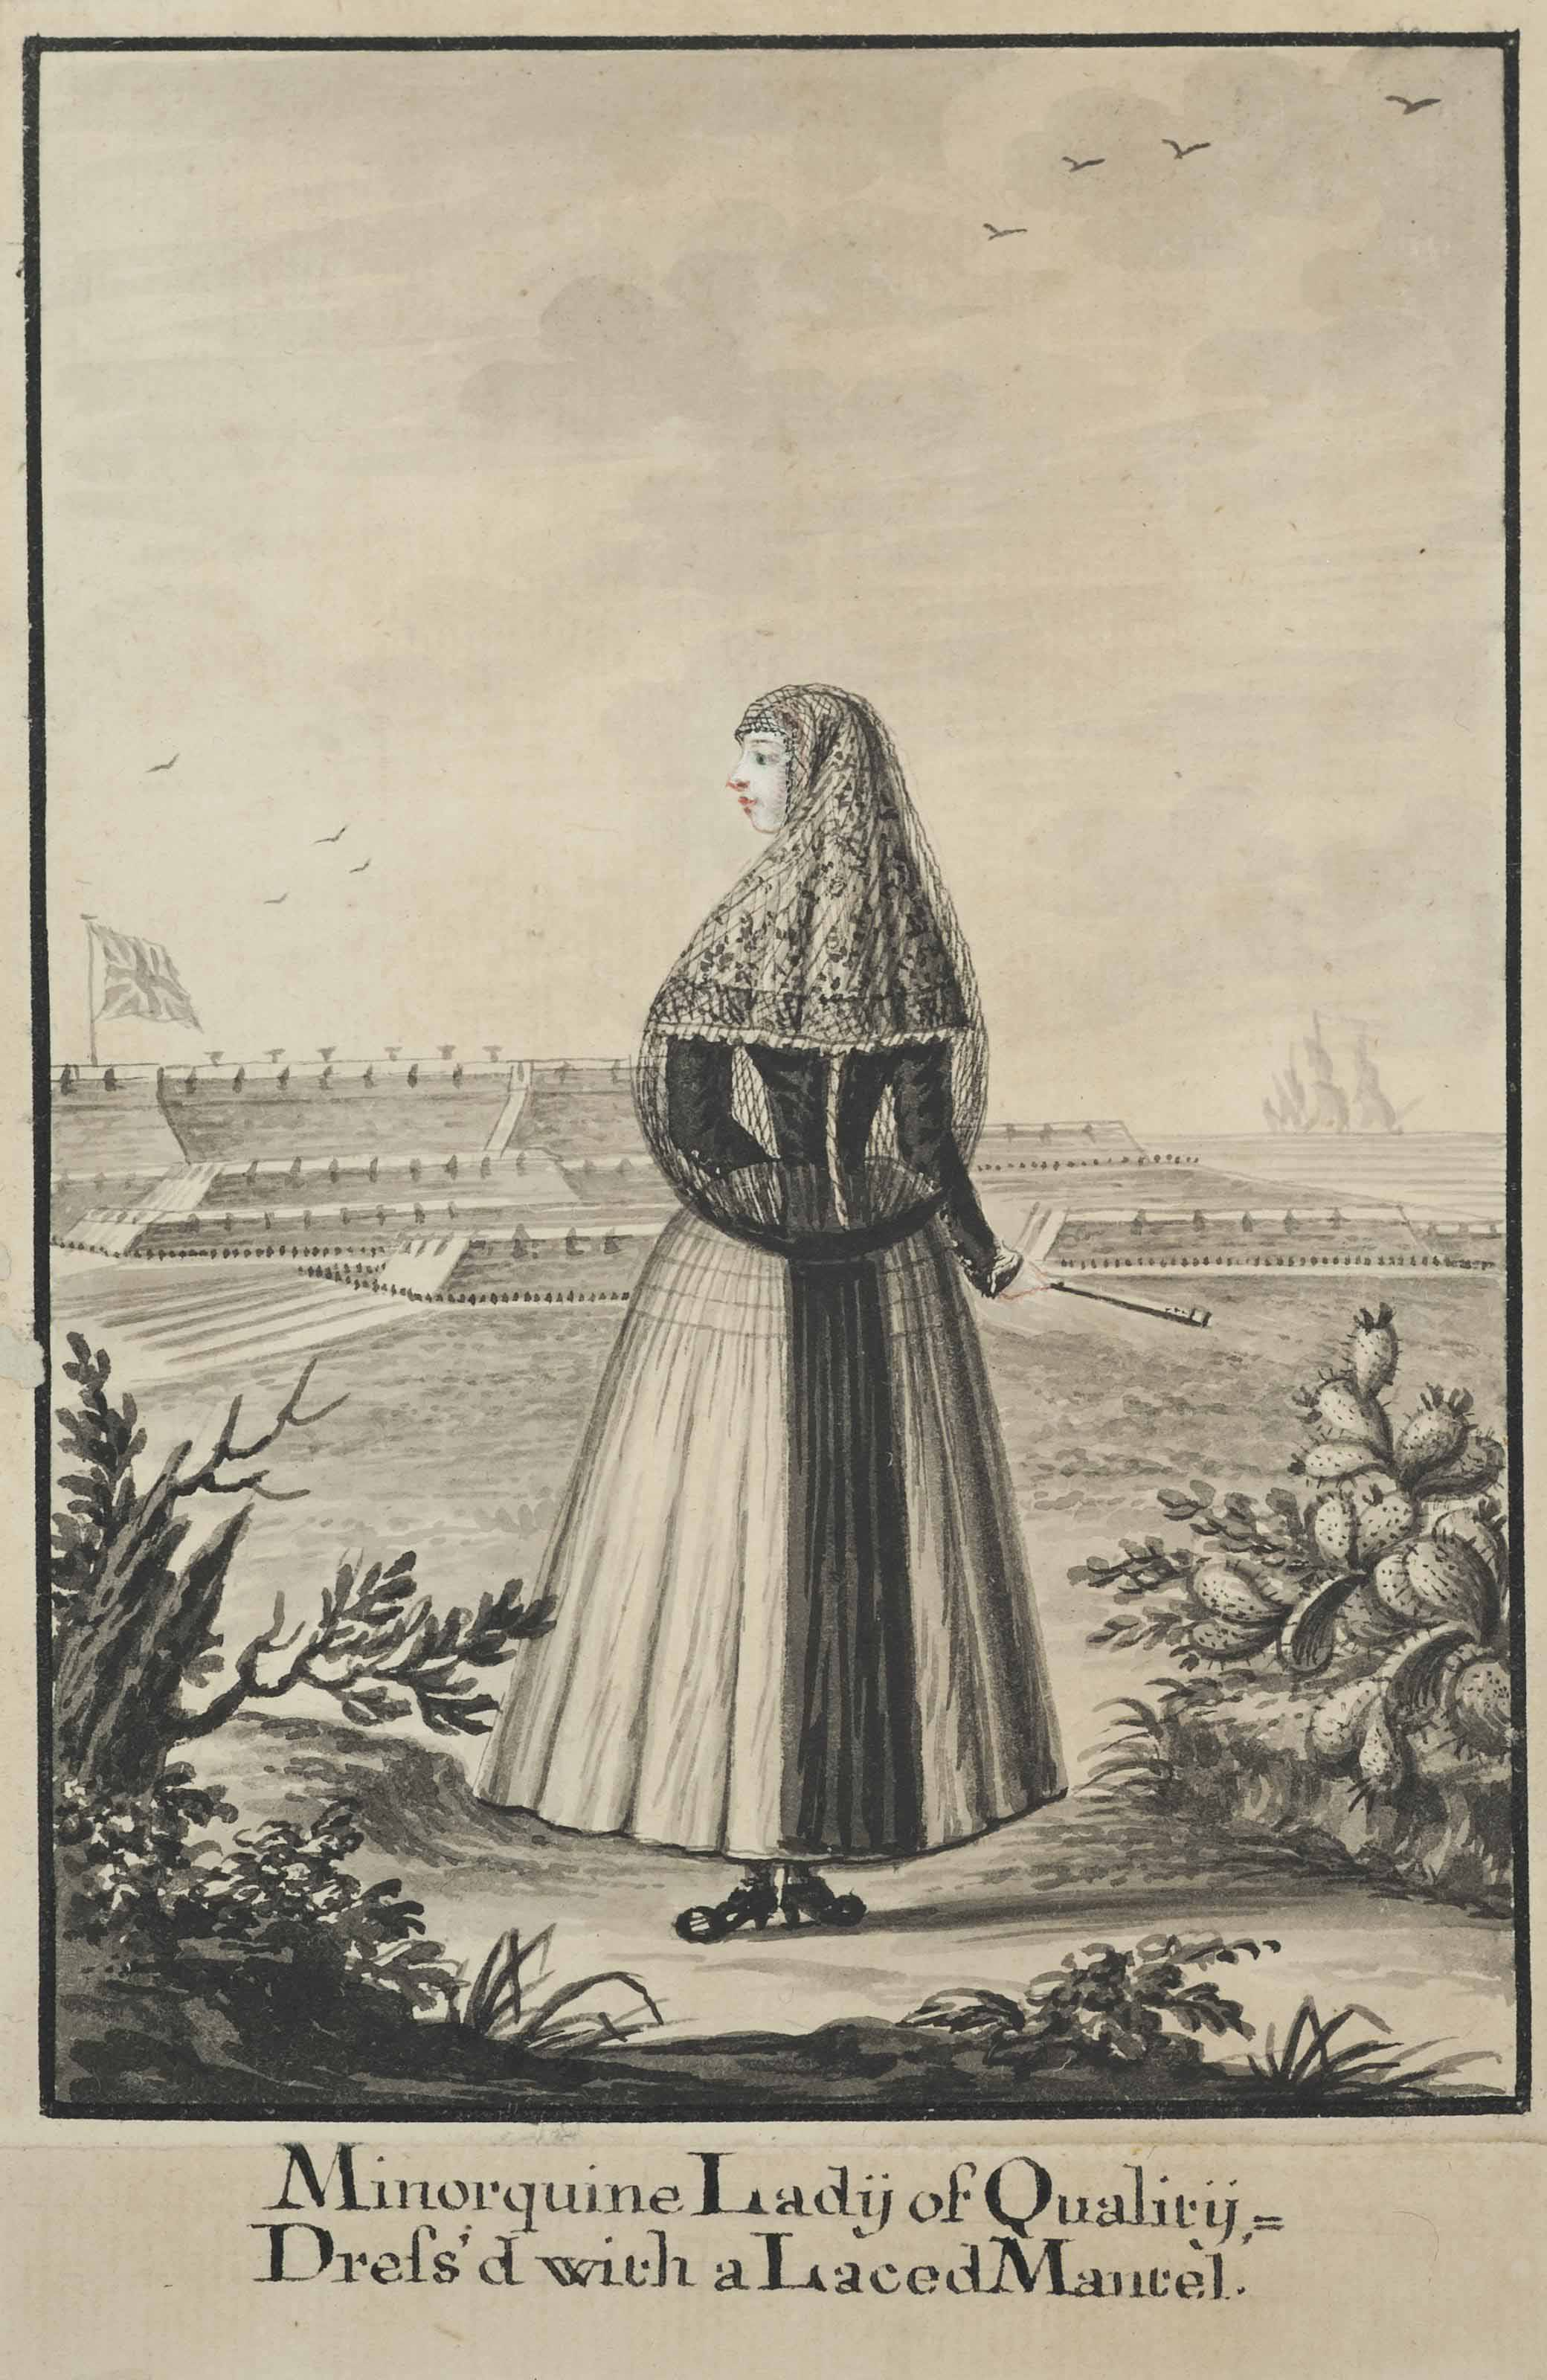 Two studies of women of Minorca